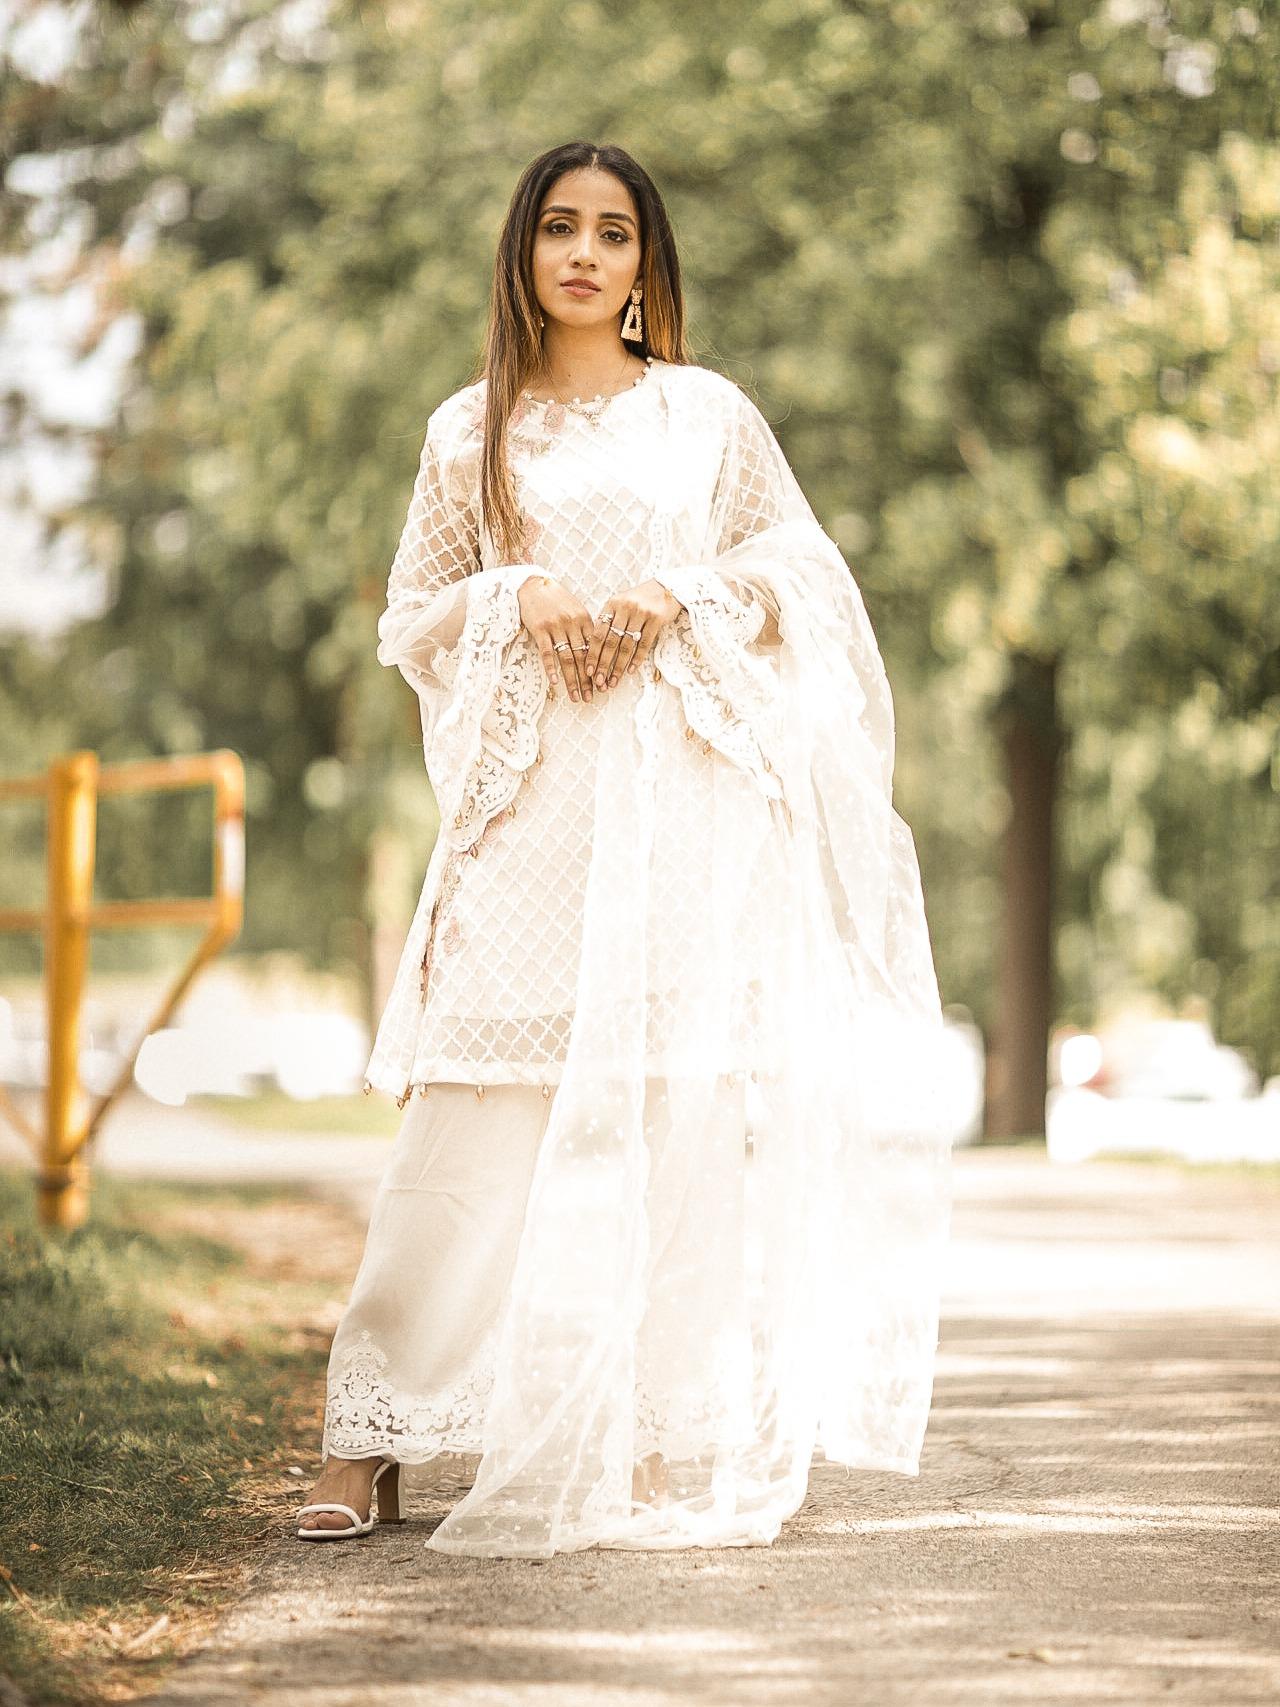 Faiza Inam Sincerely Humble Desi wear pakistani wear south asian wear looks 3